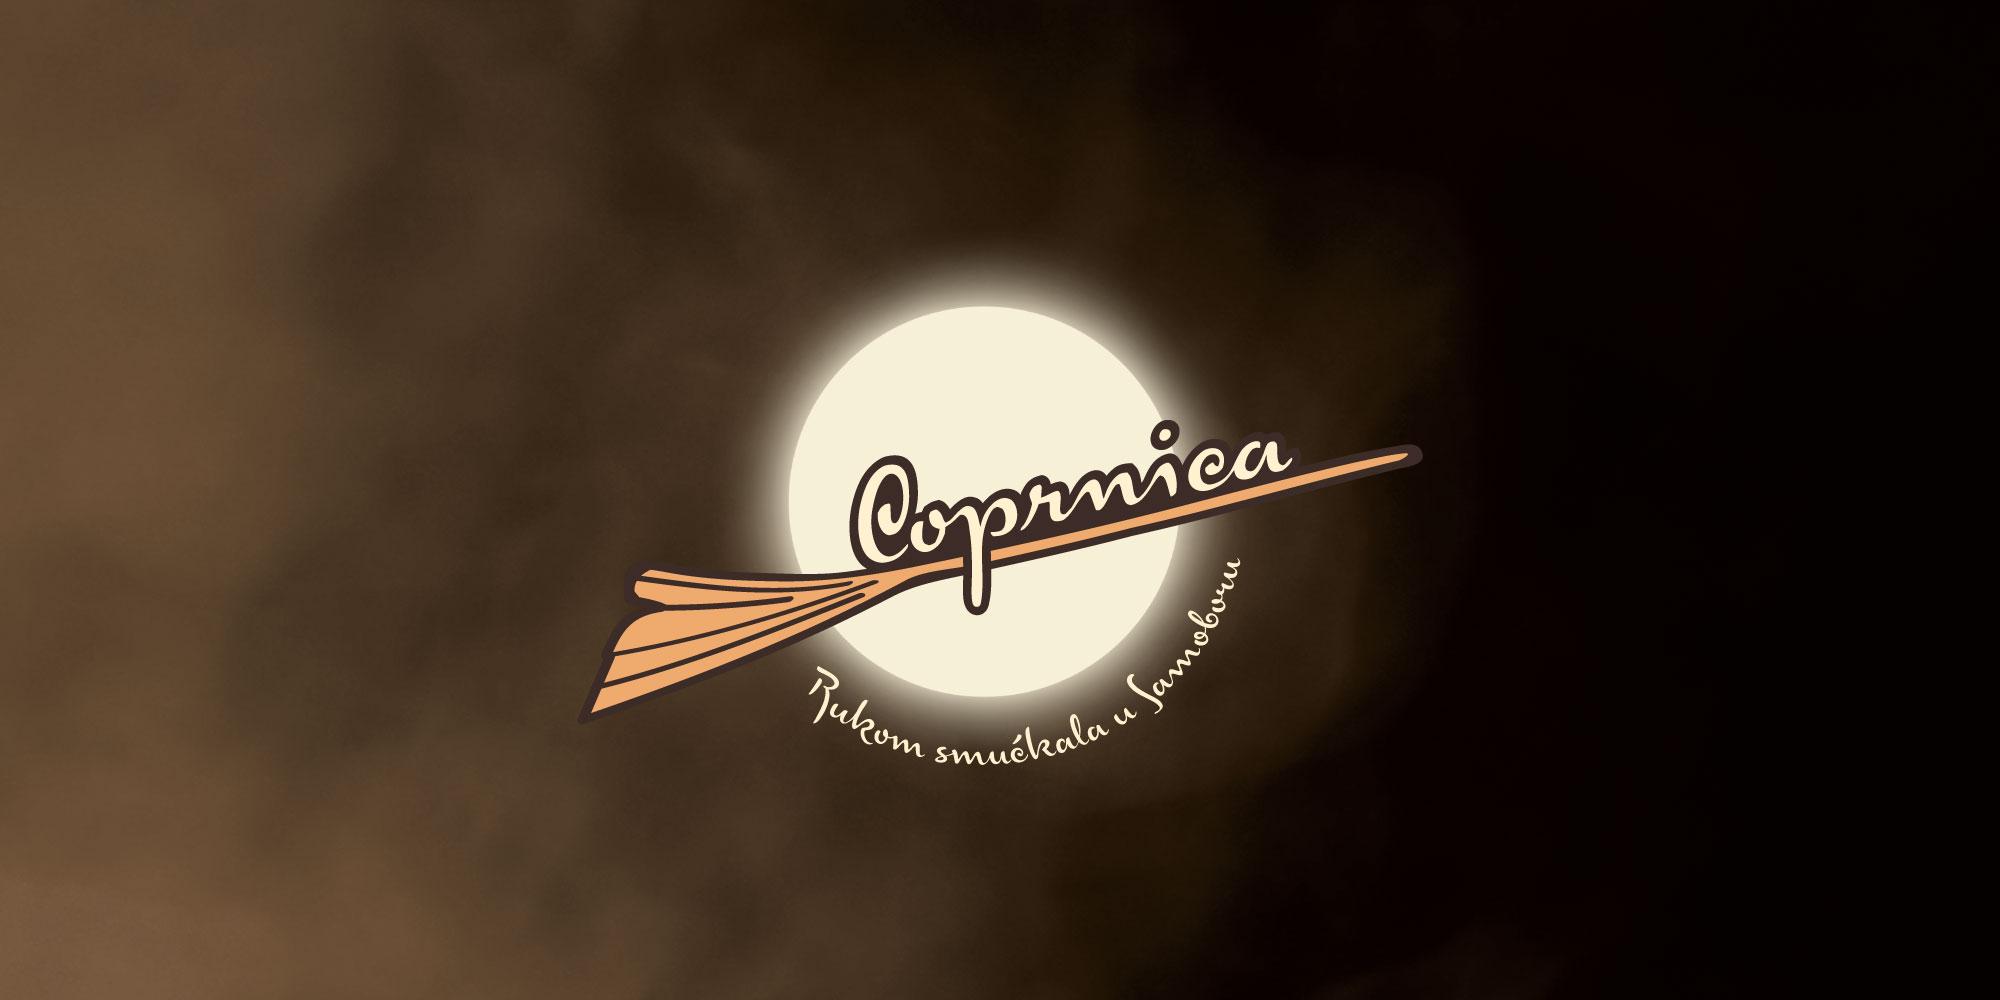 masavukmanovic.com - coprnica packaging 01